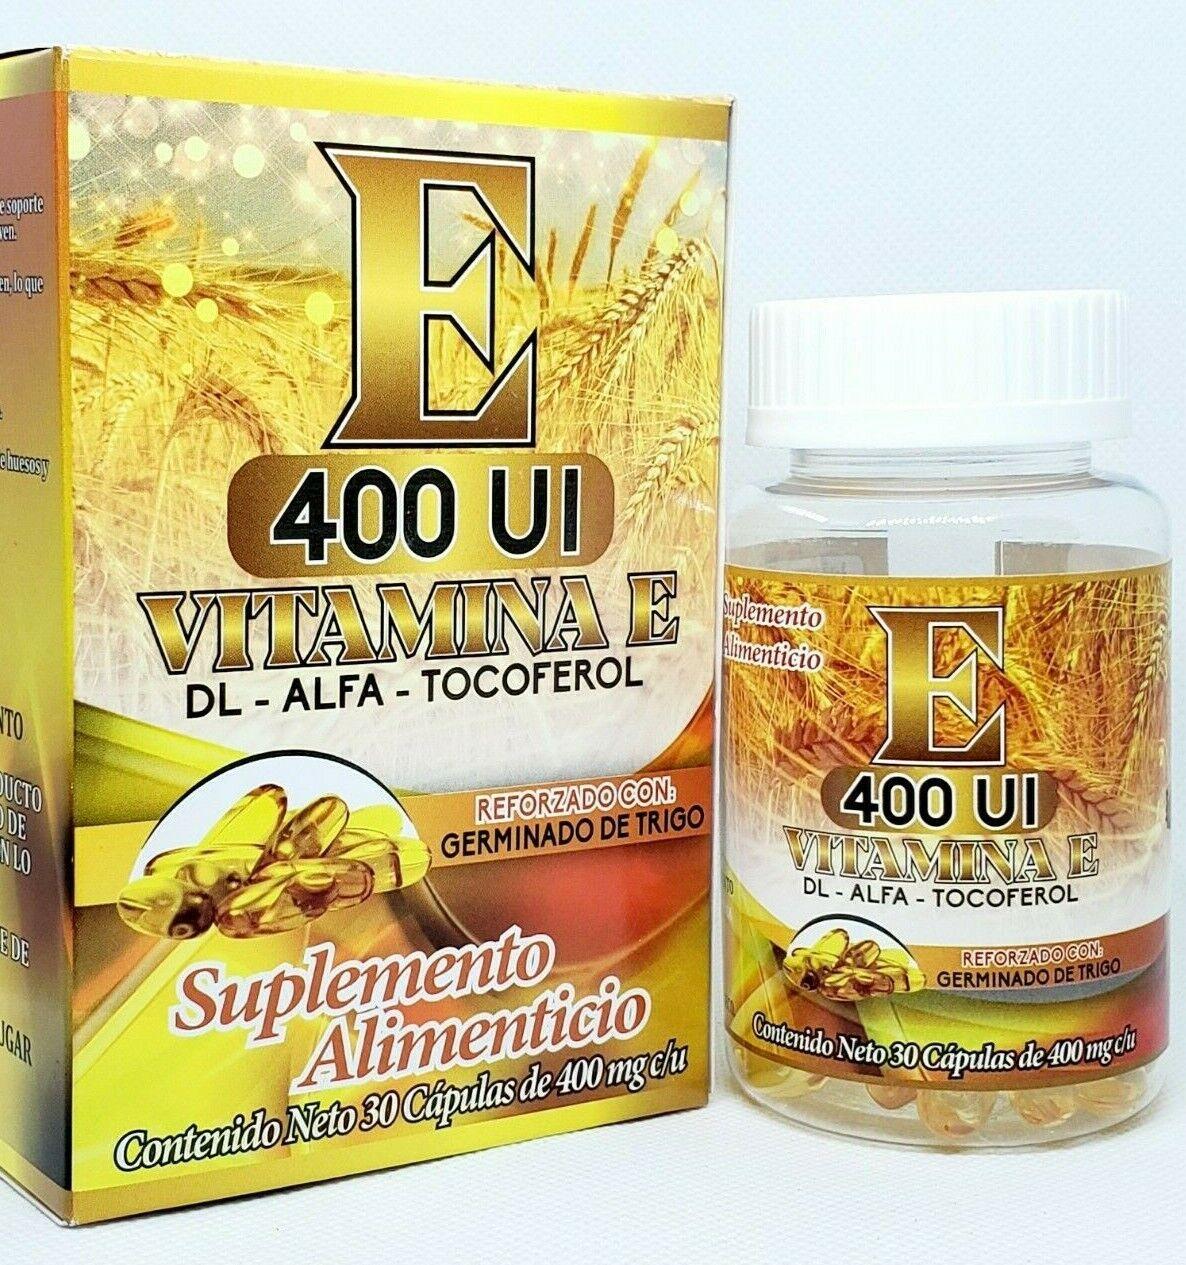 Vitamin E Tocoferol 400 UI Vitamina E refrozado con germinado de trigo